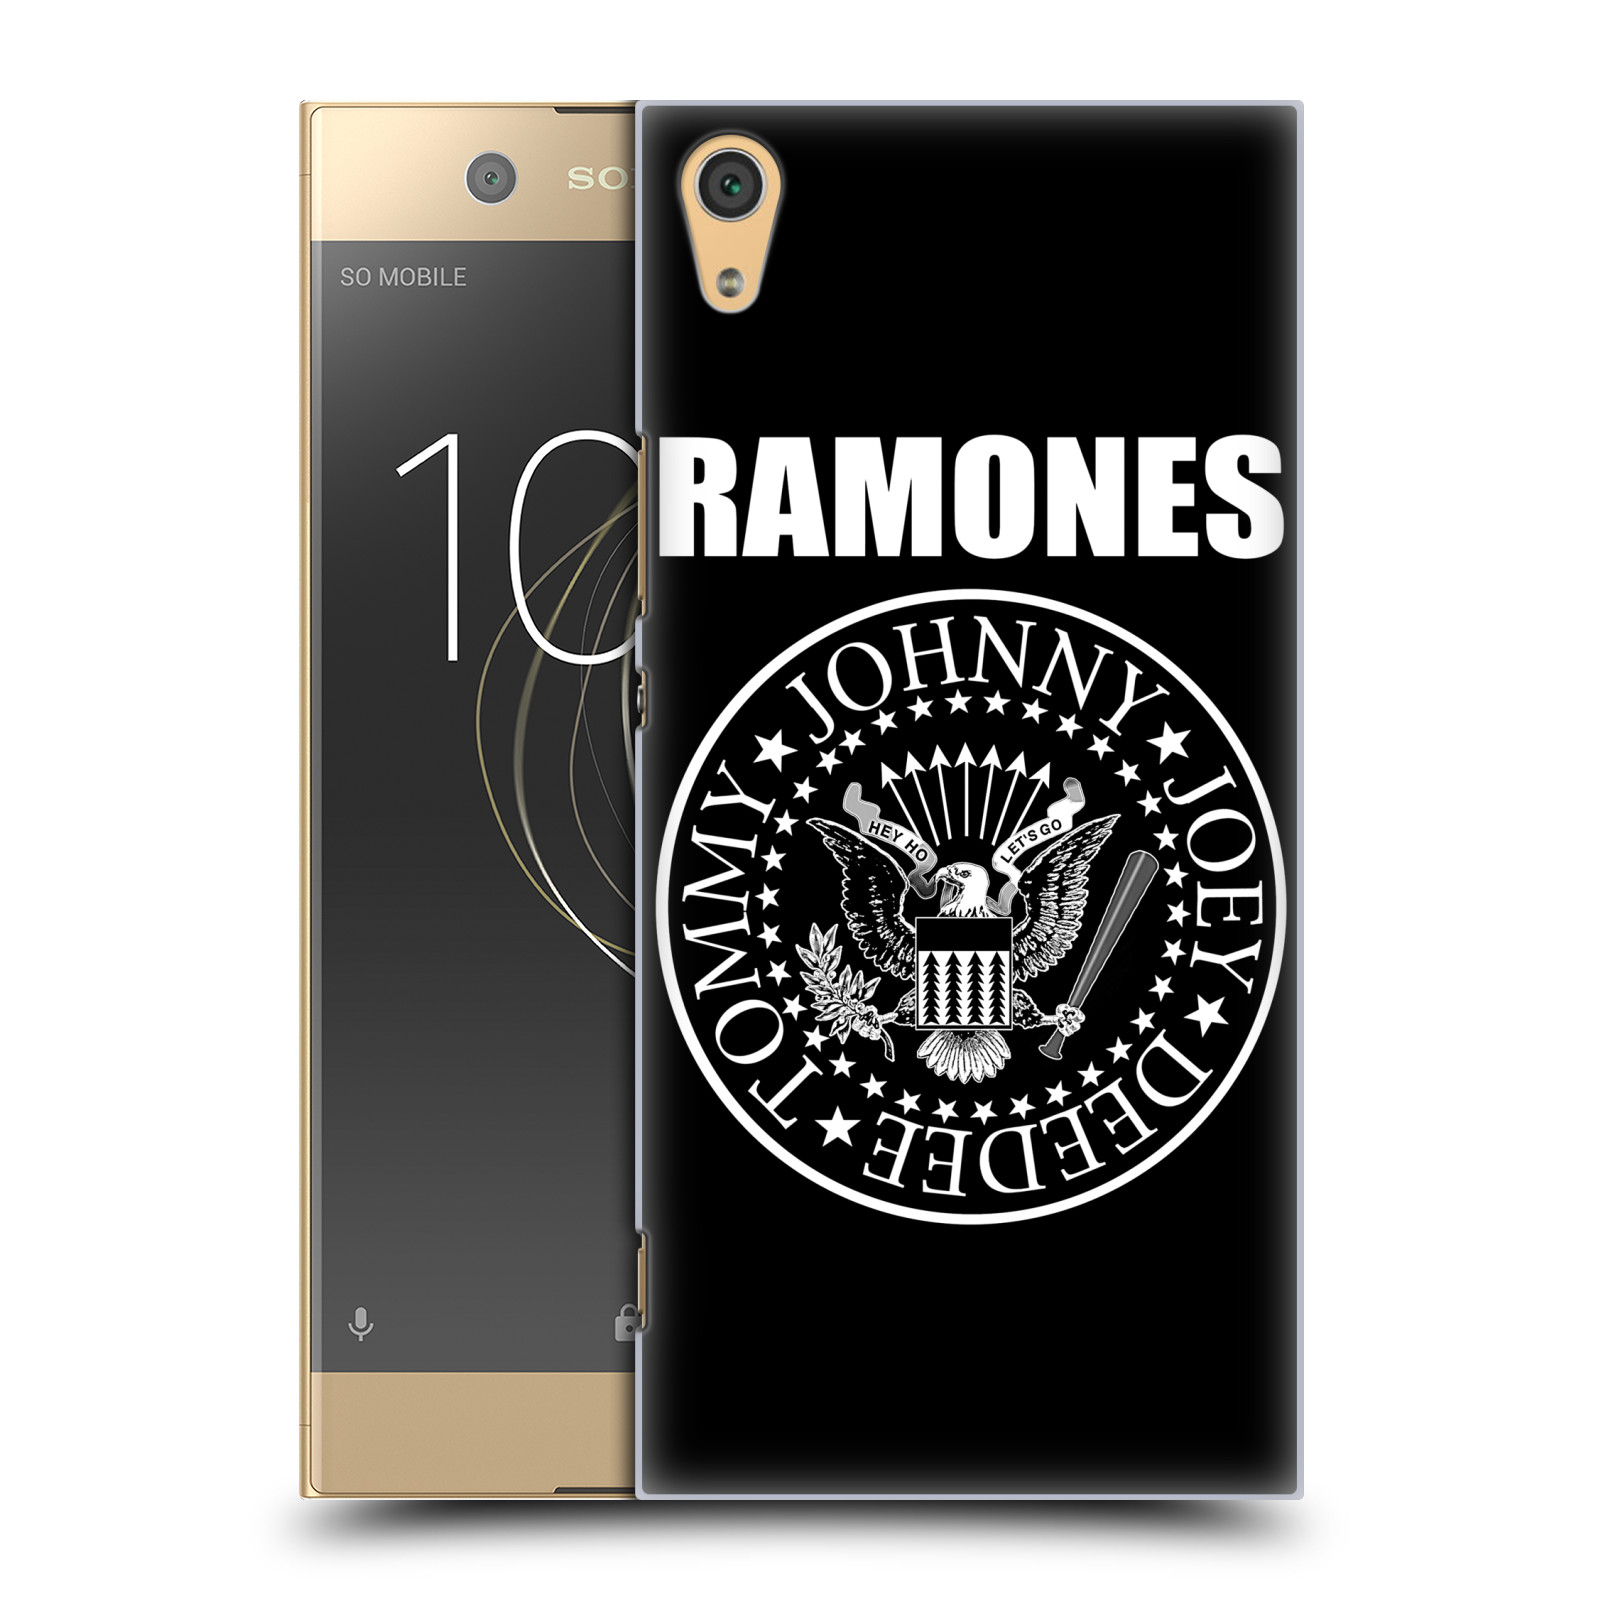 Plastové pouzdro na mobil Sony Xperia XA1 Ultra - Head Case - The Ramones - PRESIDENTIAL SEAL